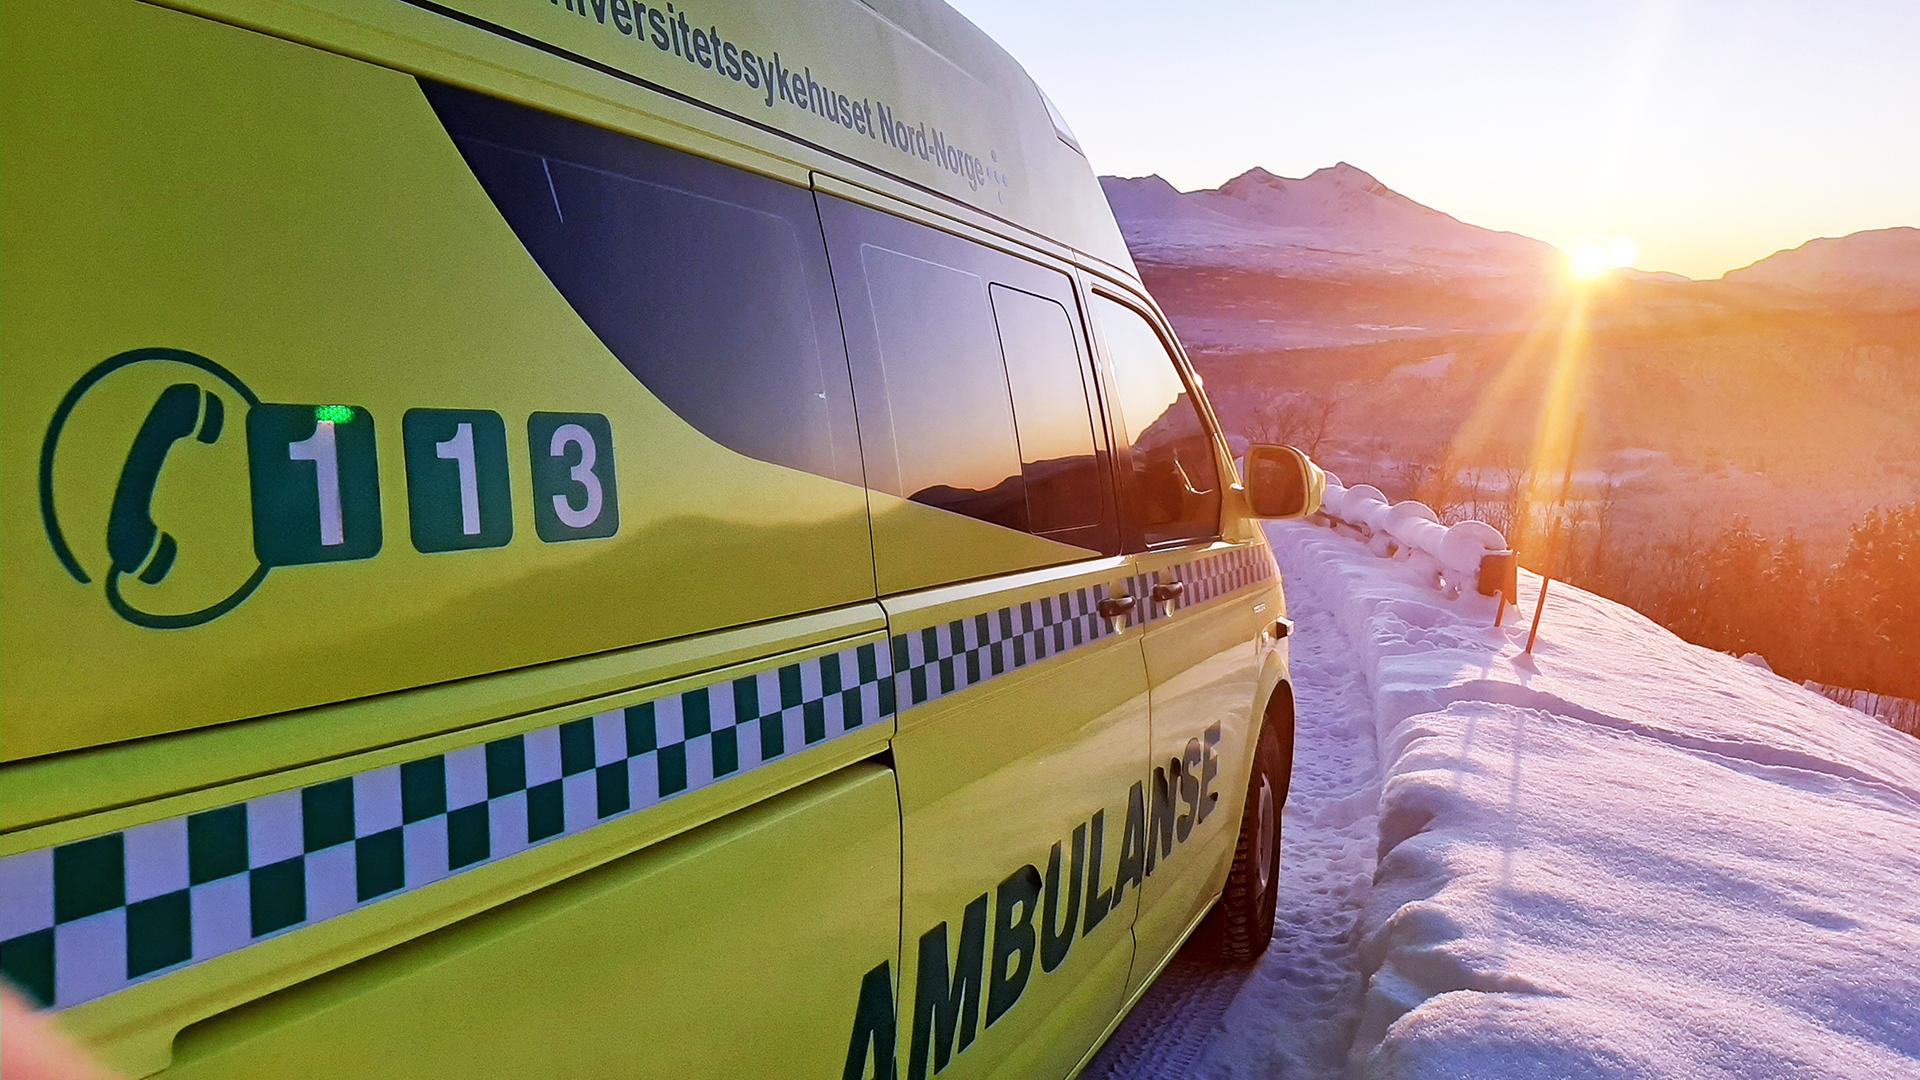 Bilde av ambulanse i solnedgang, Cingulum